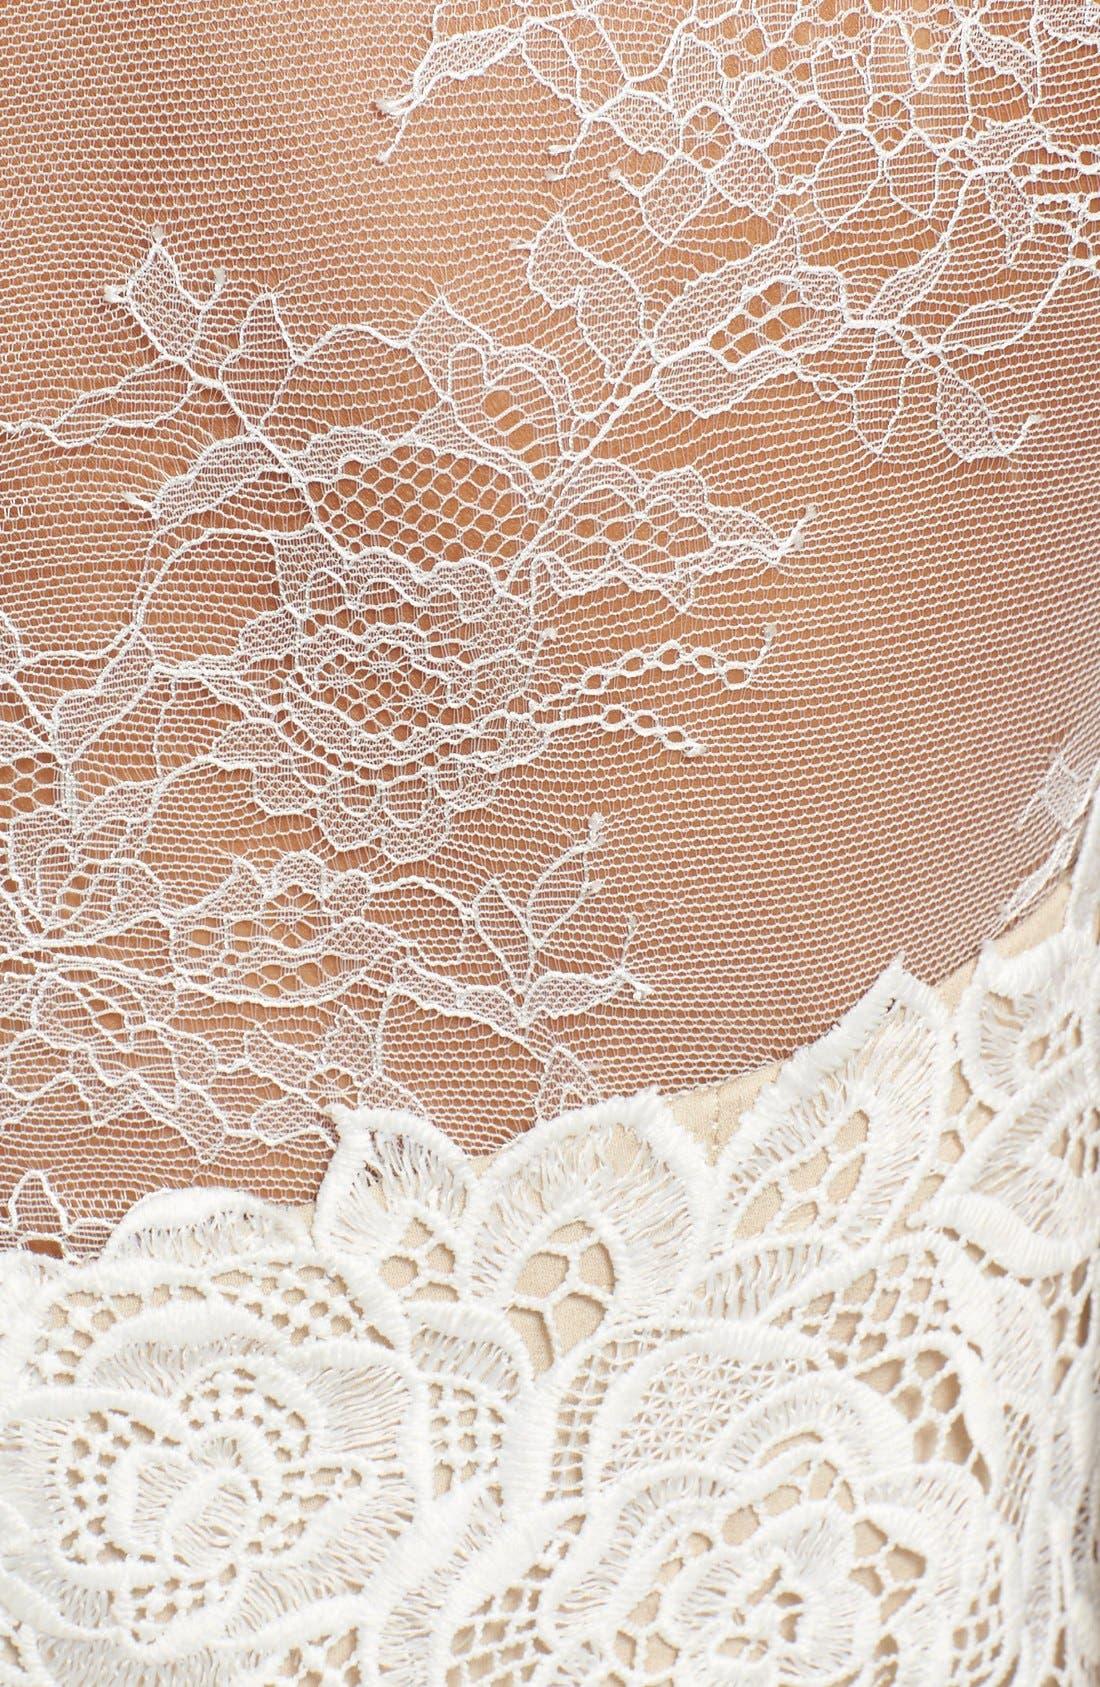 Monique Lhuillier Ready to Wed Guipure Lace Jumpsuit,                             Alternate thumbnail 5, color,                             Silk White/ Nude